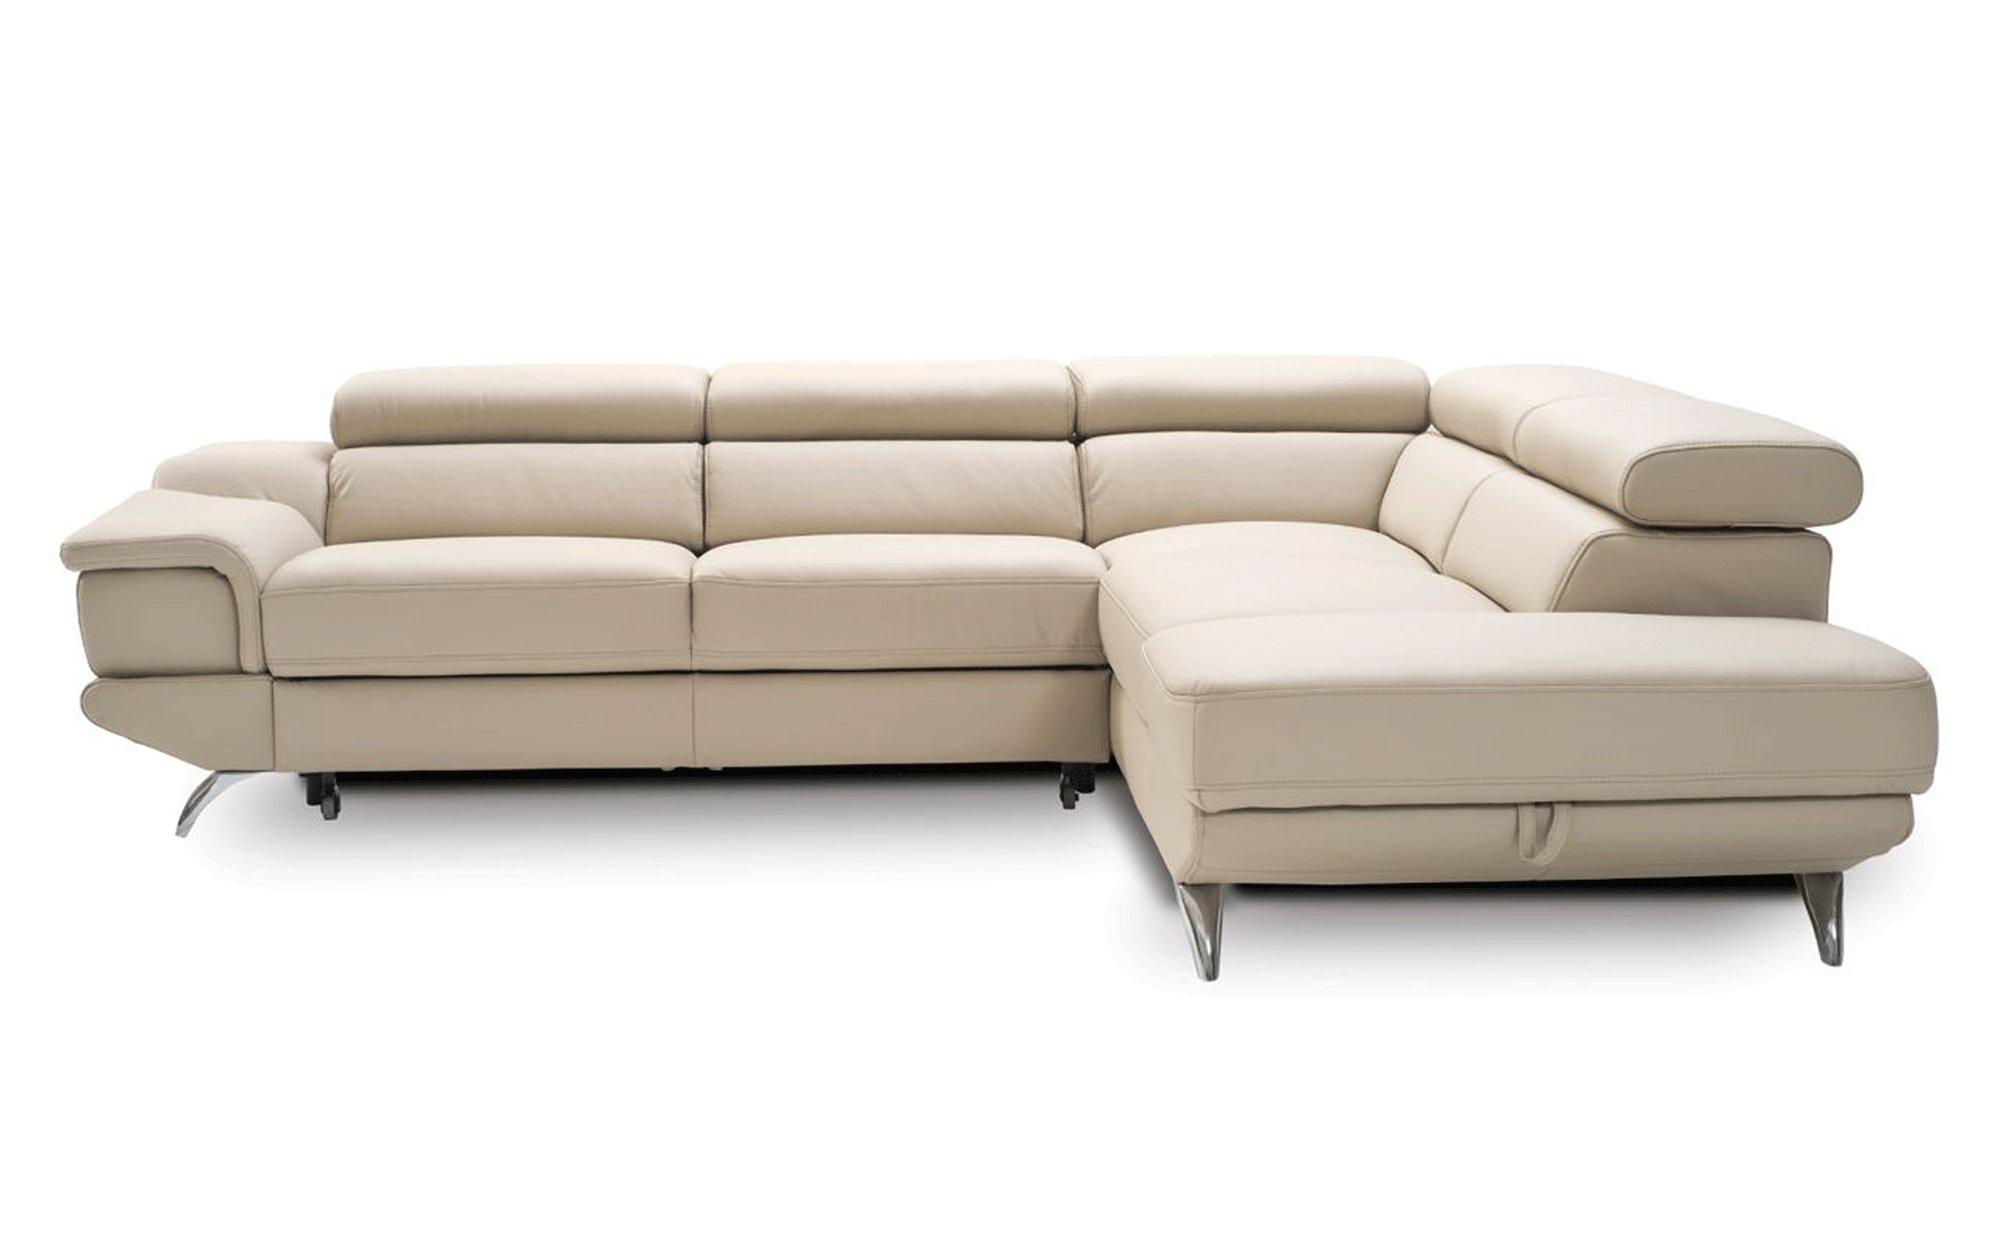 Exclusive Italian Top Grain Leather Sectional Sofa San